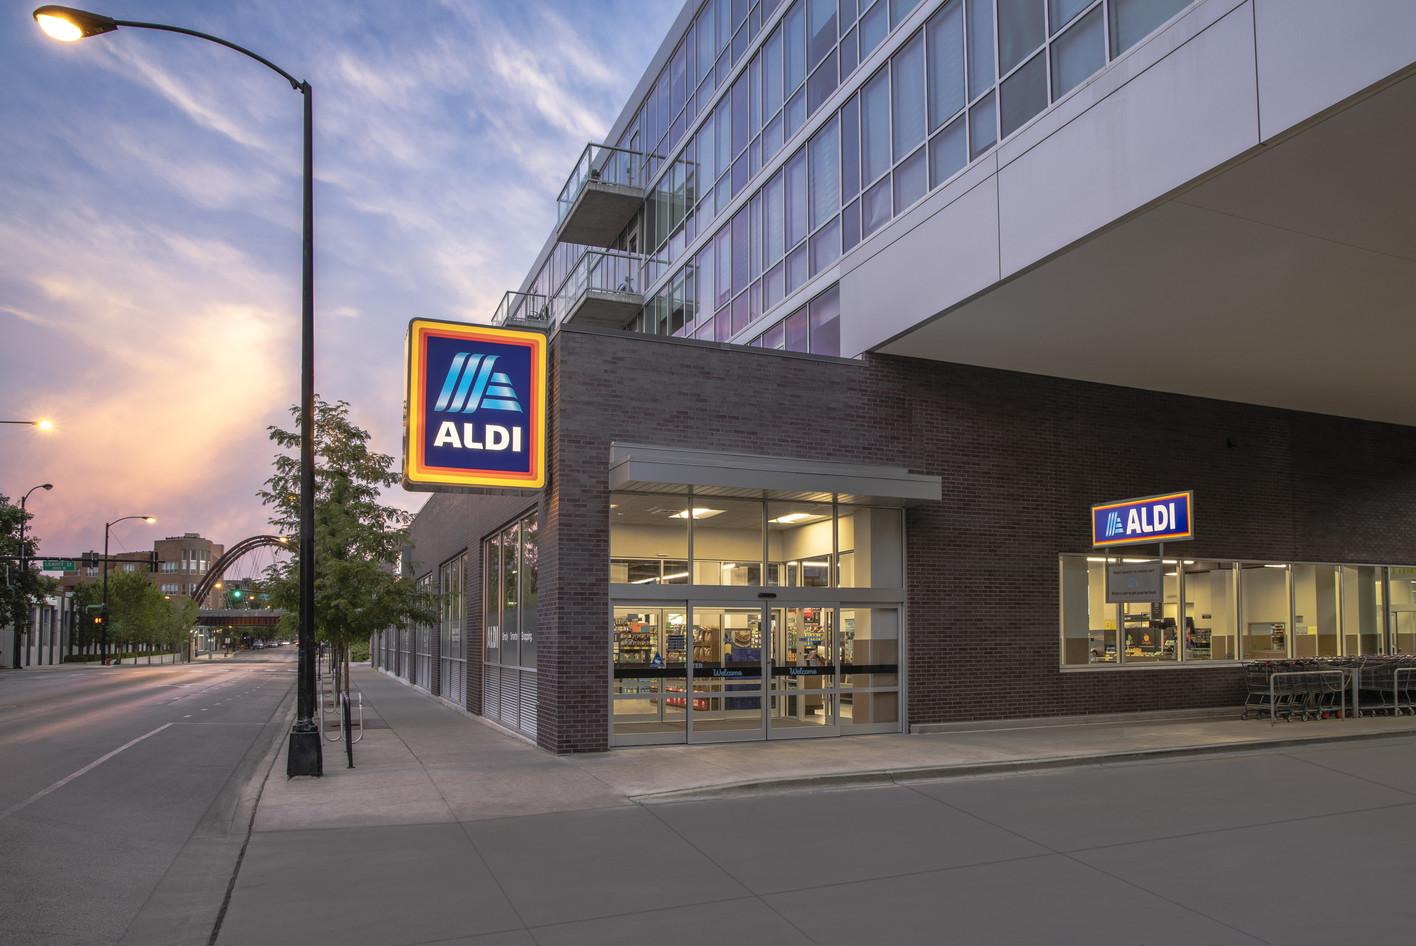 An Aldi storefront in Chicago's Logan Square neighborhood. (Courtesy Aldi)